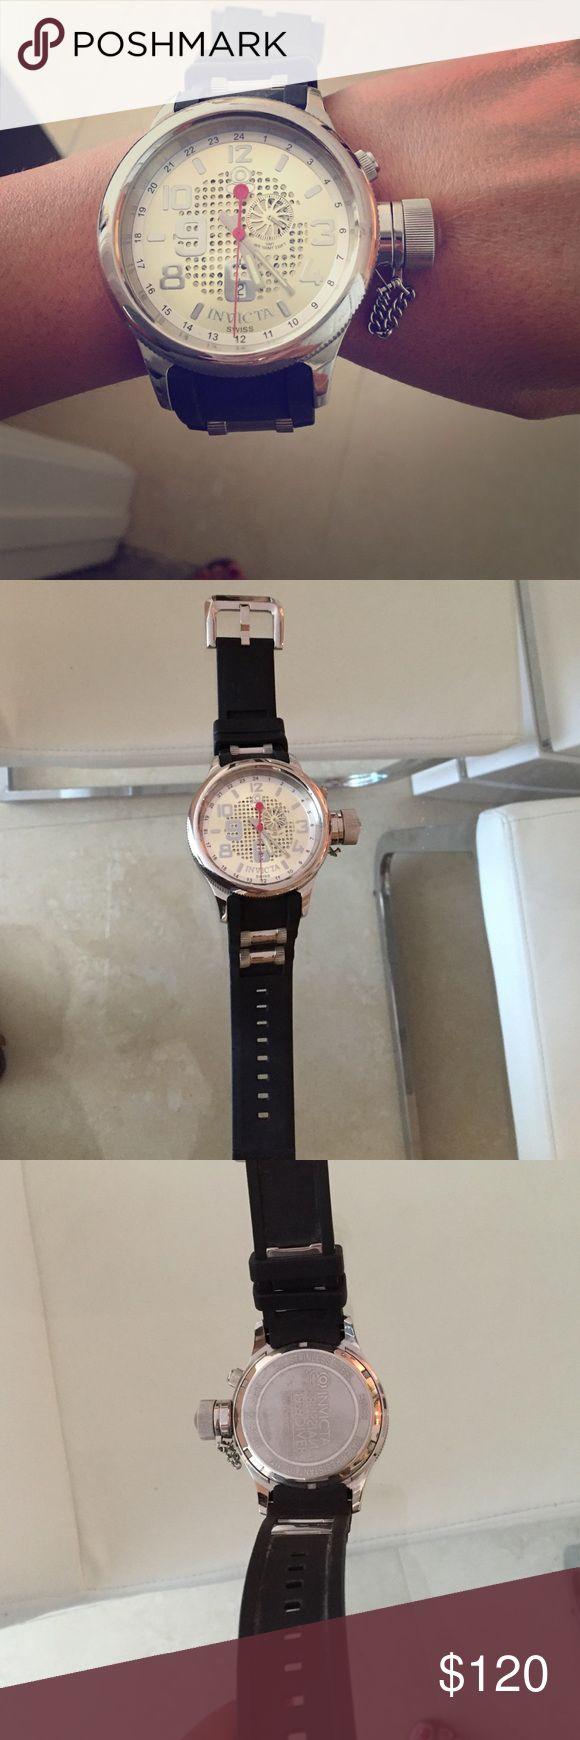 Authentic Mens Invicta Watch, practically new Diver Invicta Mens watch, black rubber straps Invicta Accessories Watches